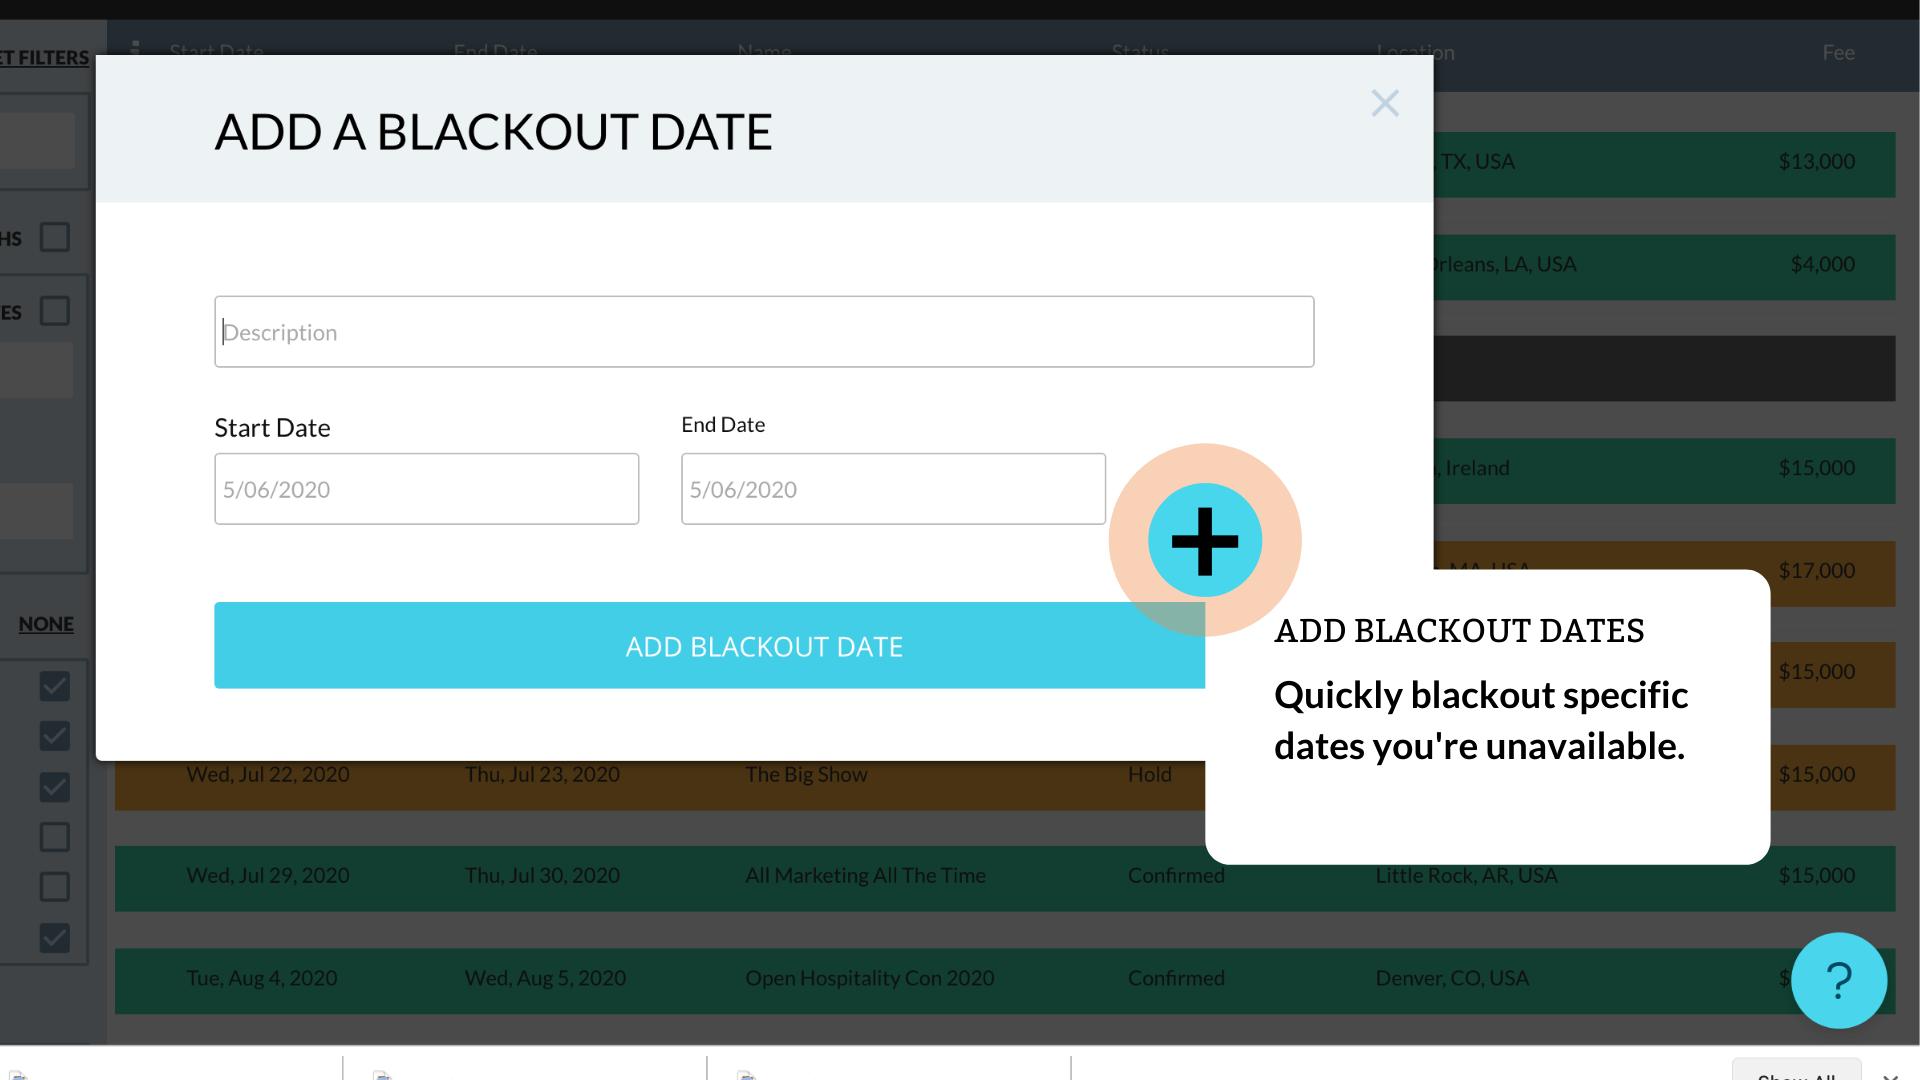 Add blackout dates